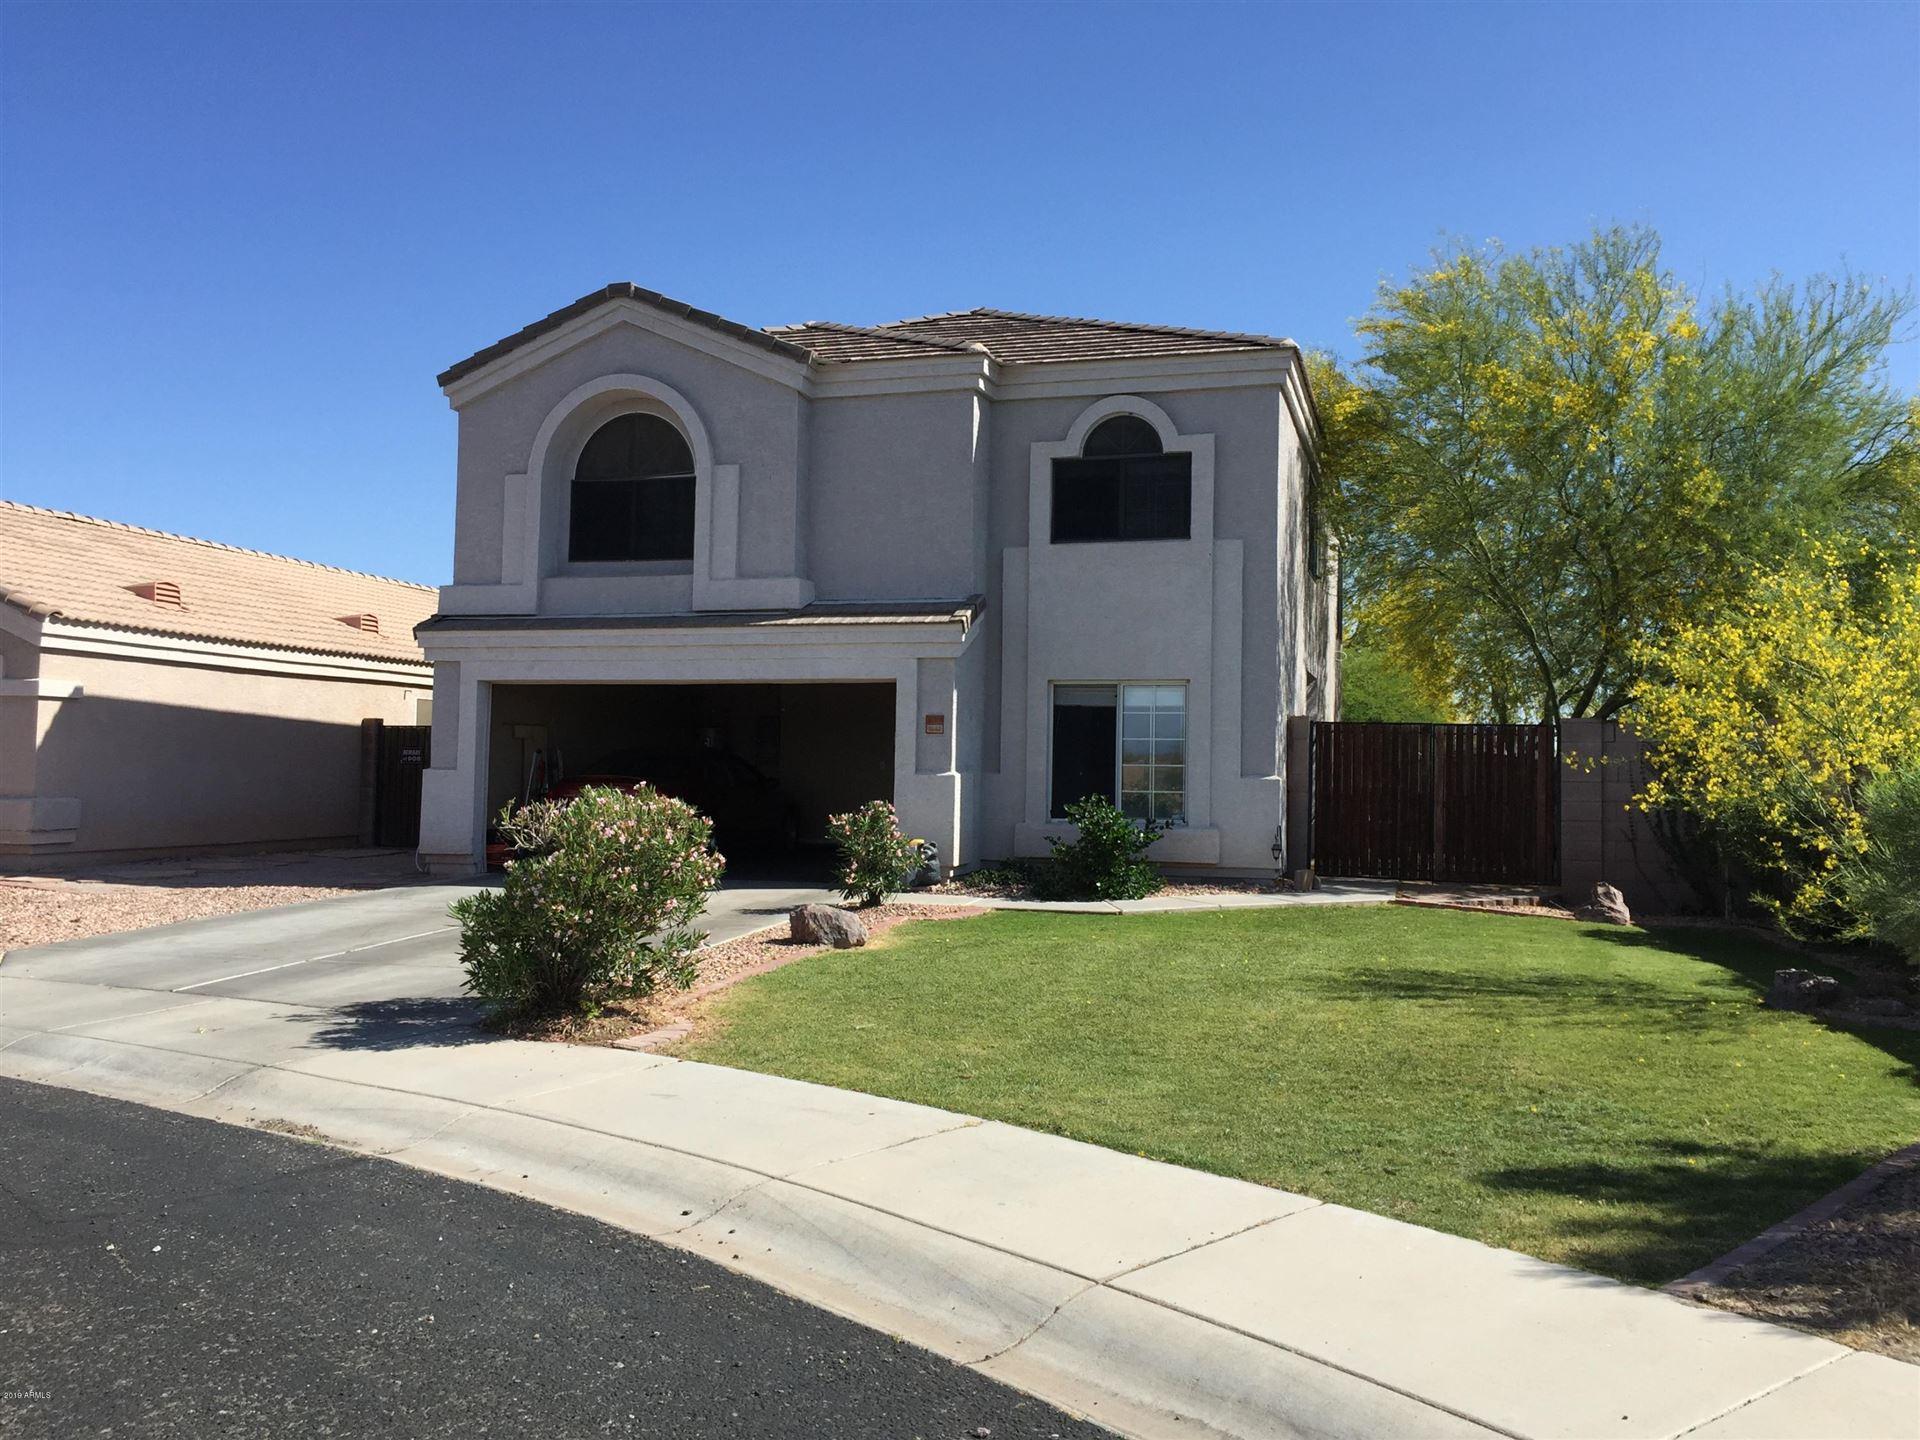 Photo of 11345 W PHILLIP JACOB Circle, Surprise, AZ 85378 (MLS # 6307853)